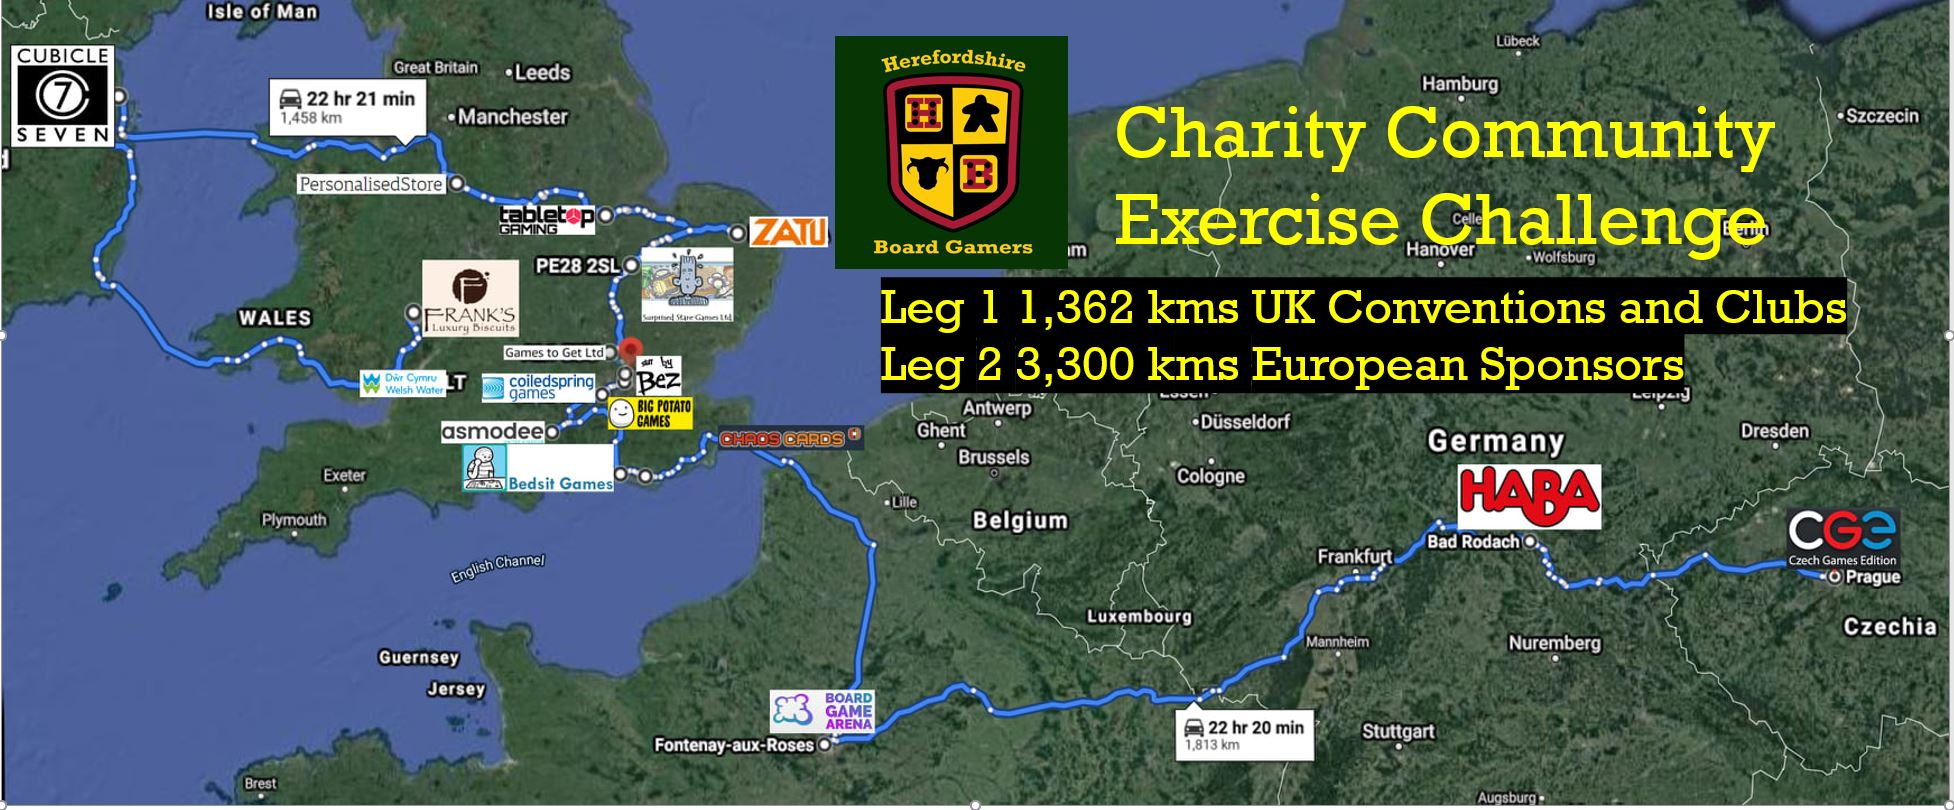 Charity community exercise challenge